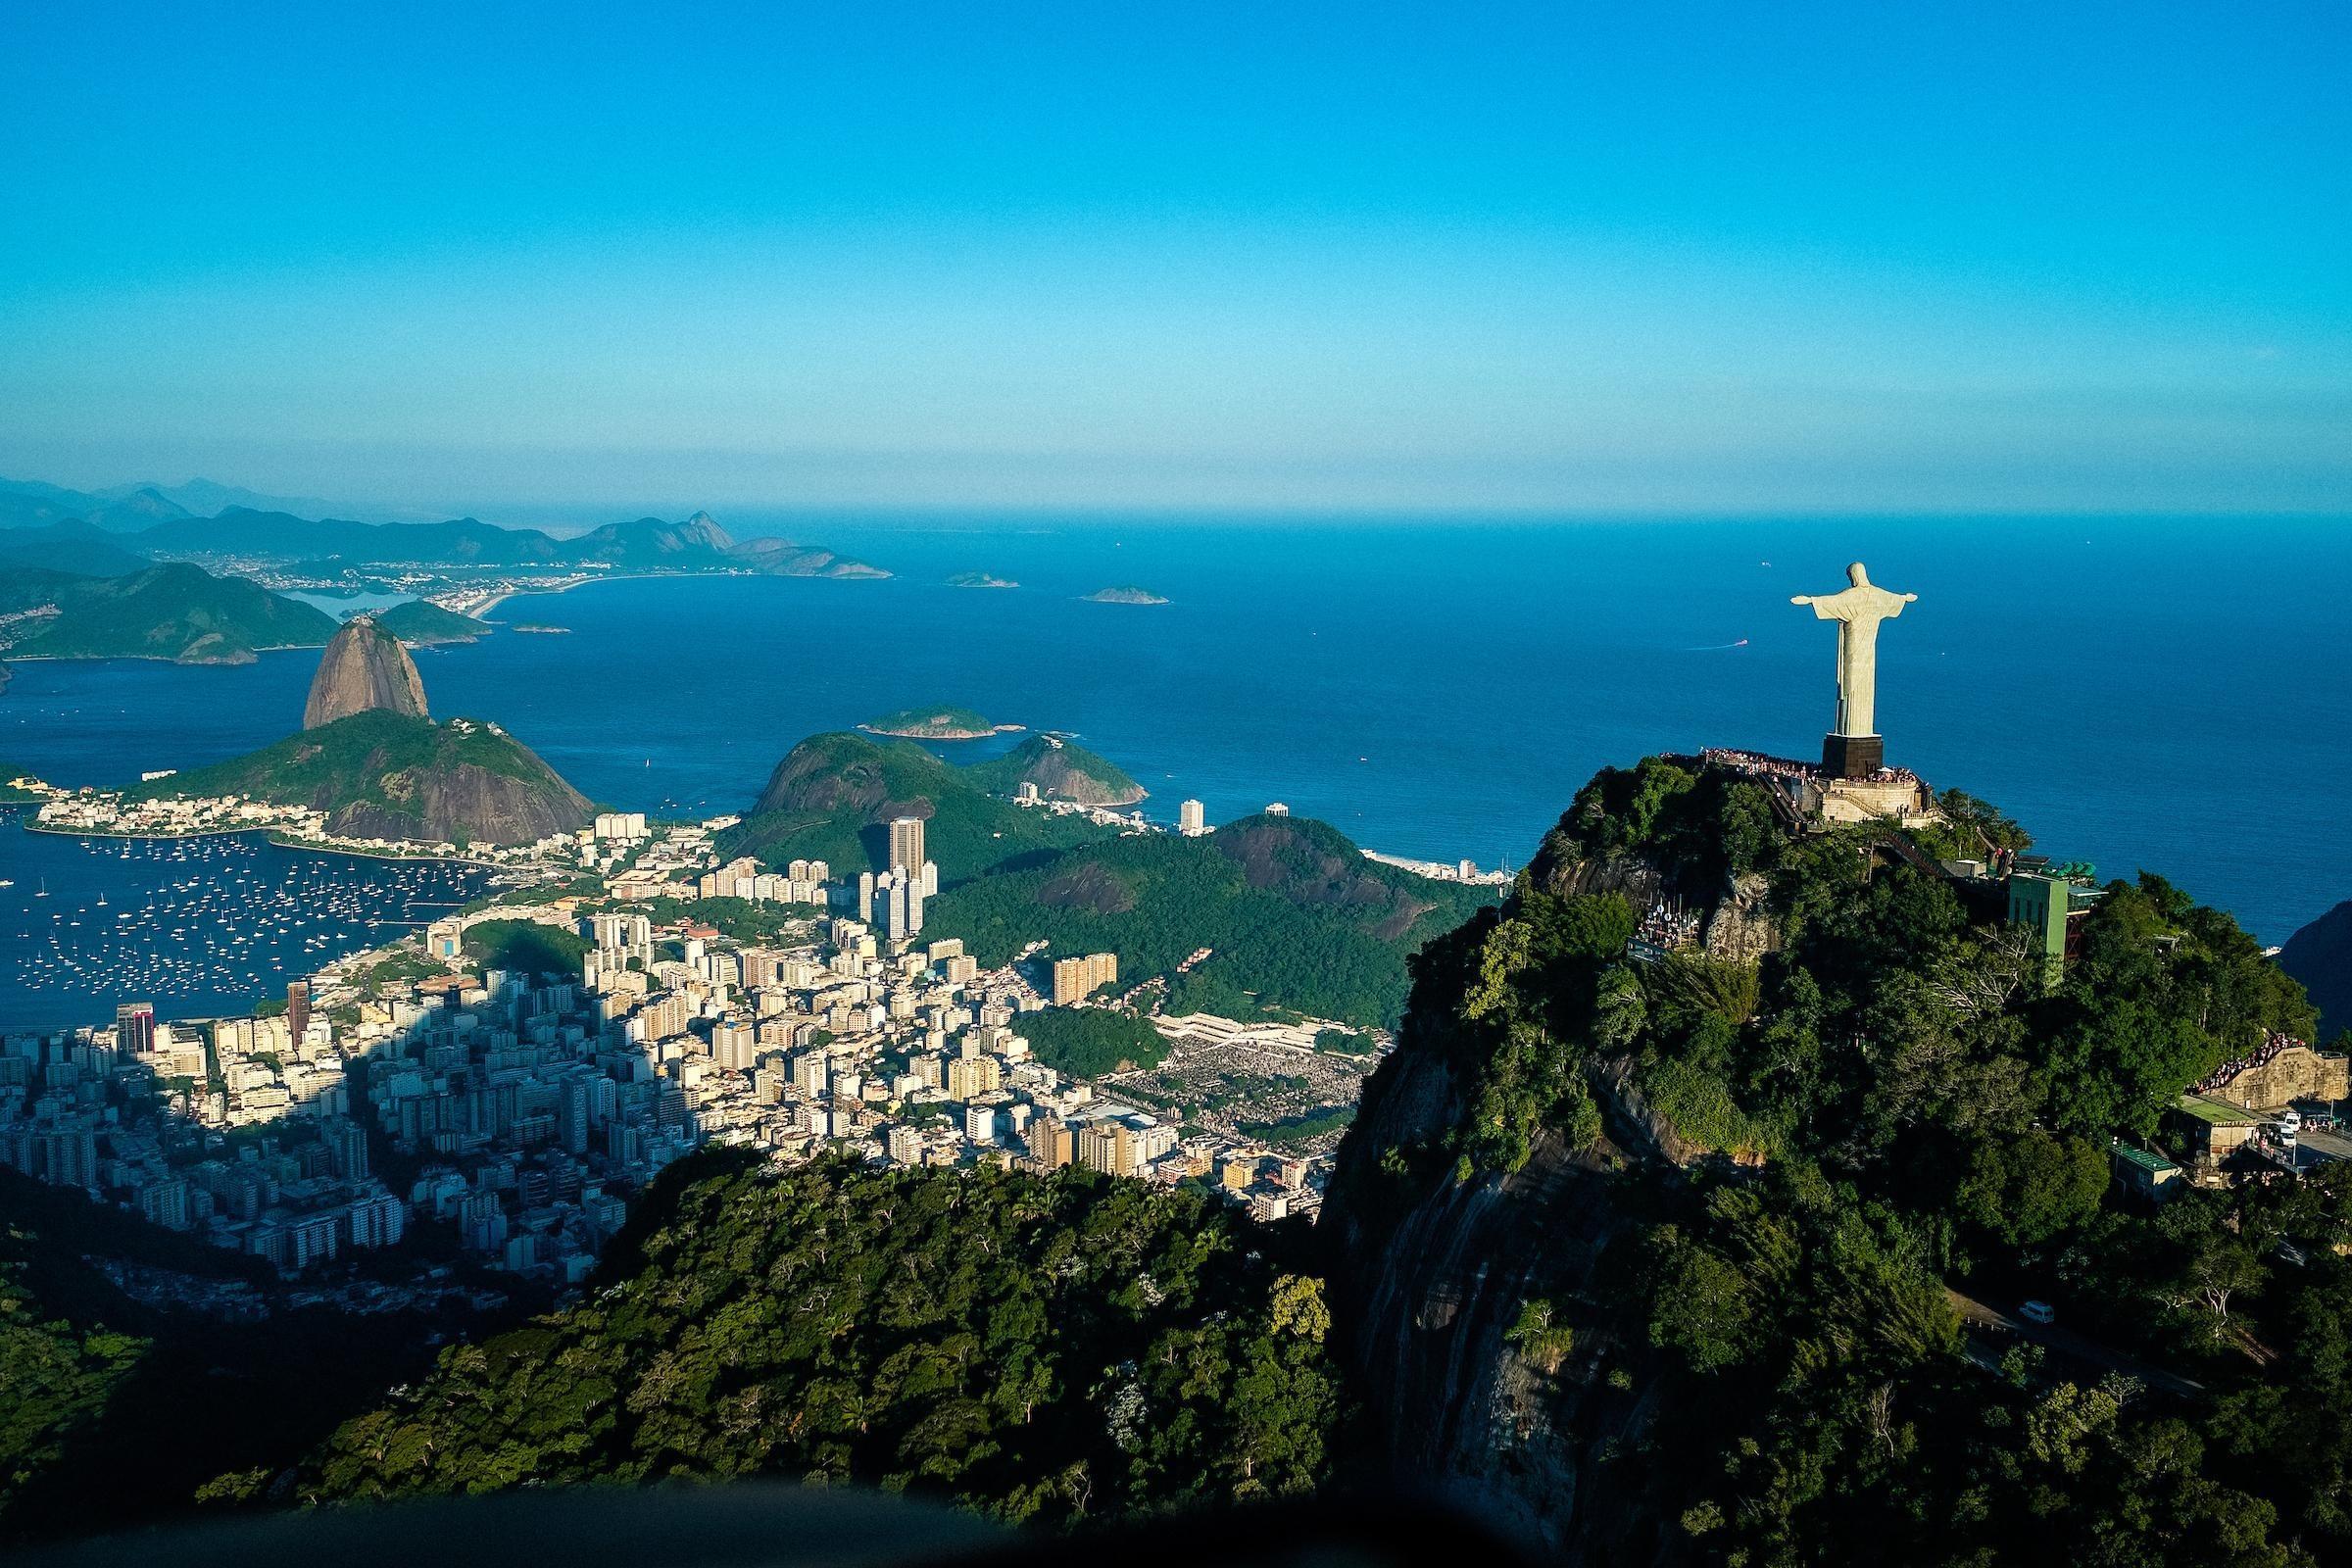 How to Spend 1 Day in Rio de Janeiro